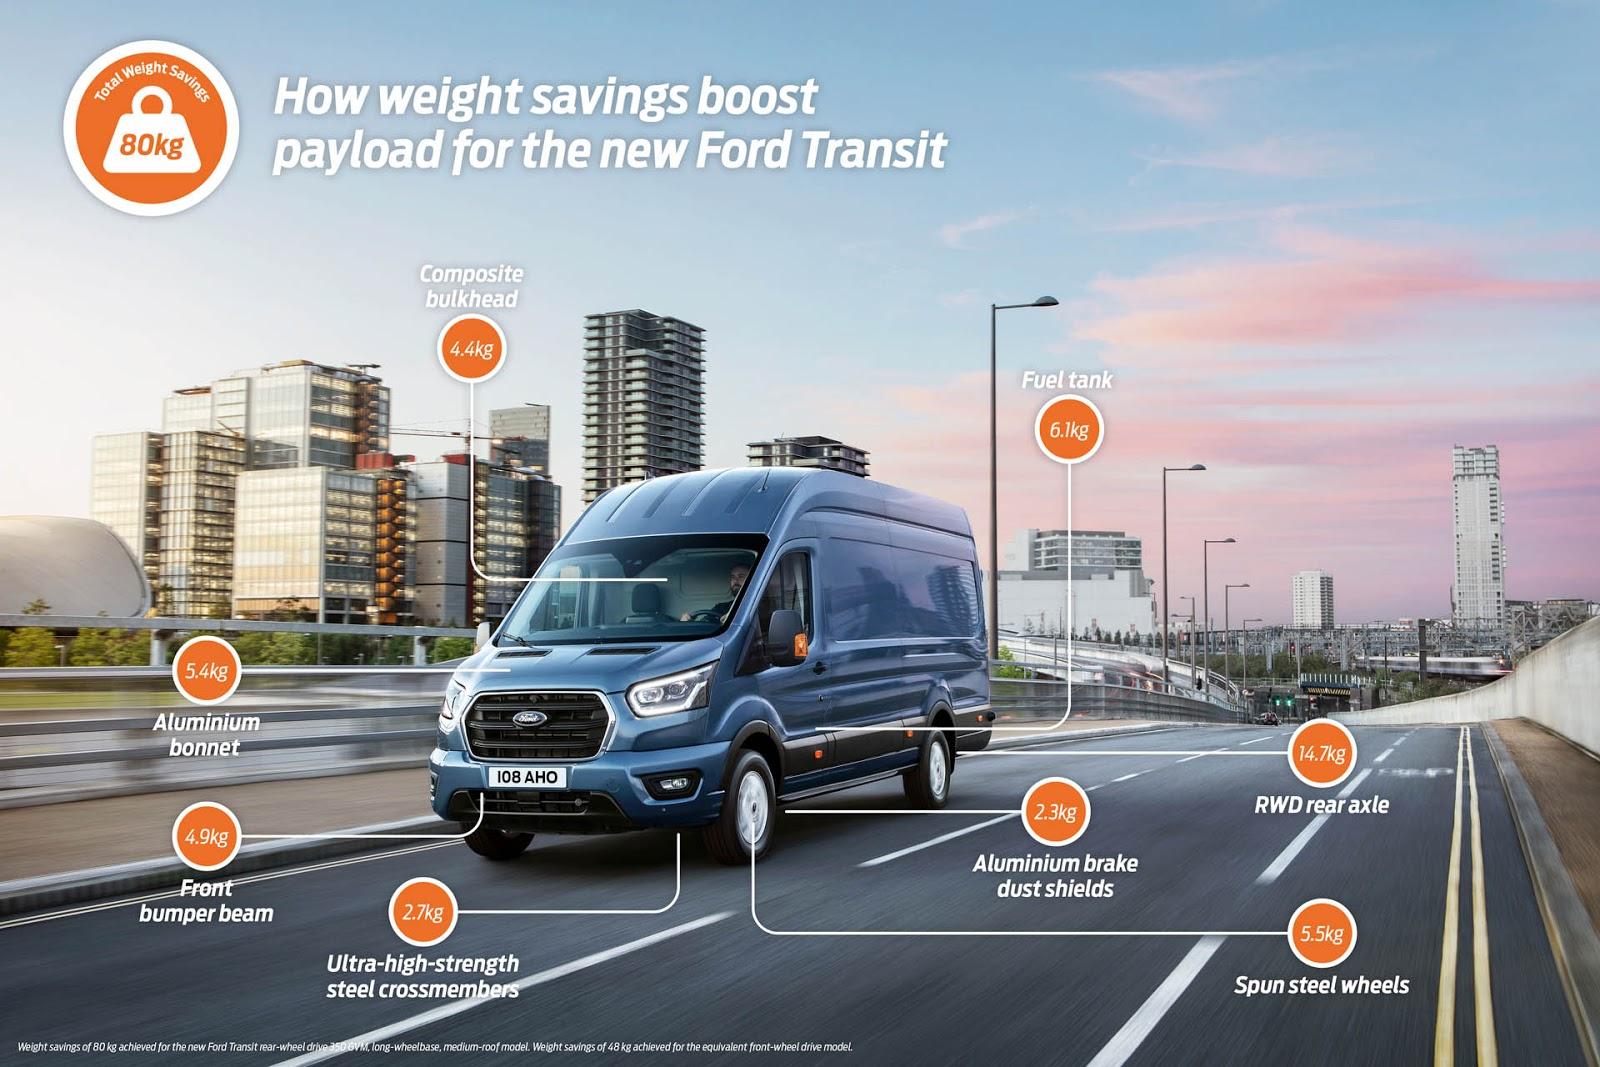 2018 FORD TRANSIT GRAPHIC 3 Δίαιτα αποφάσισε να κάνει στο νέο Transit van η Ford